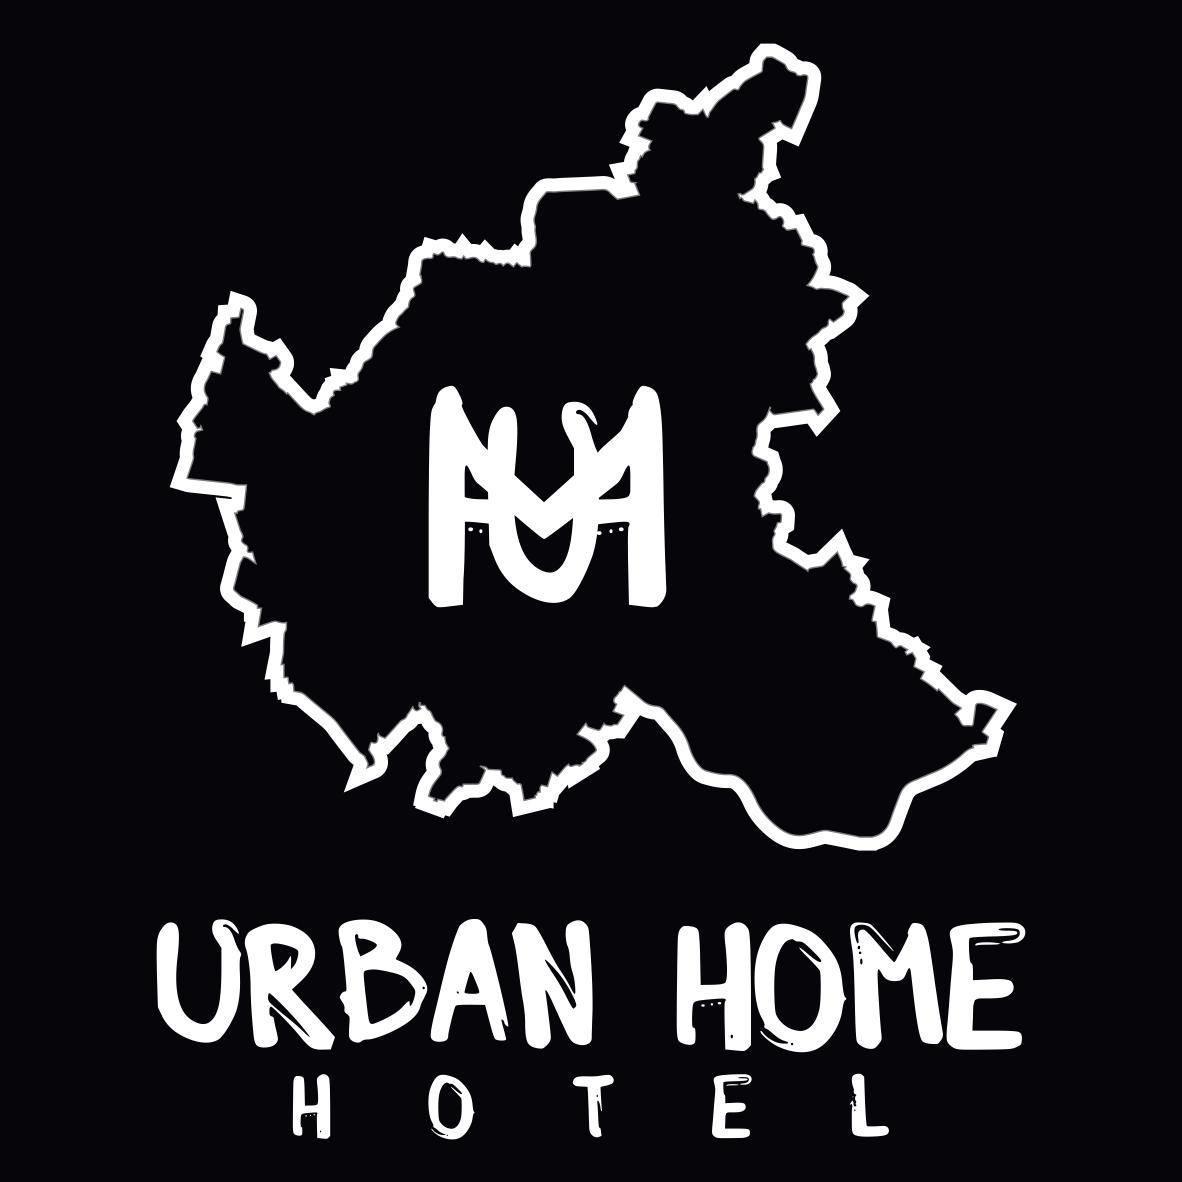 Urban Home Hotel